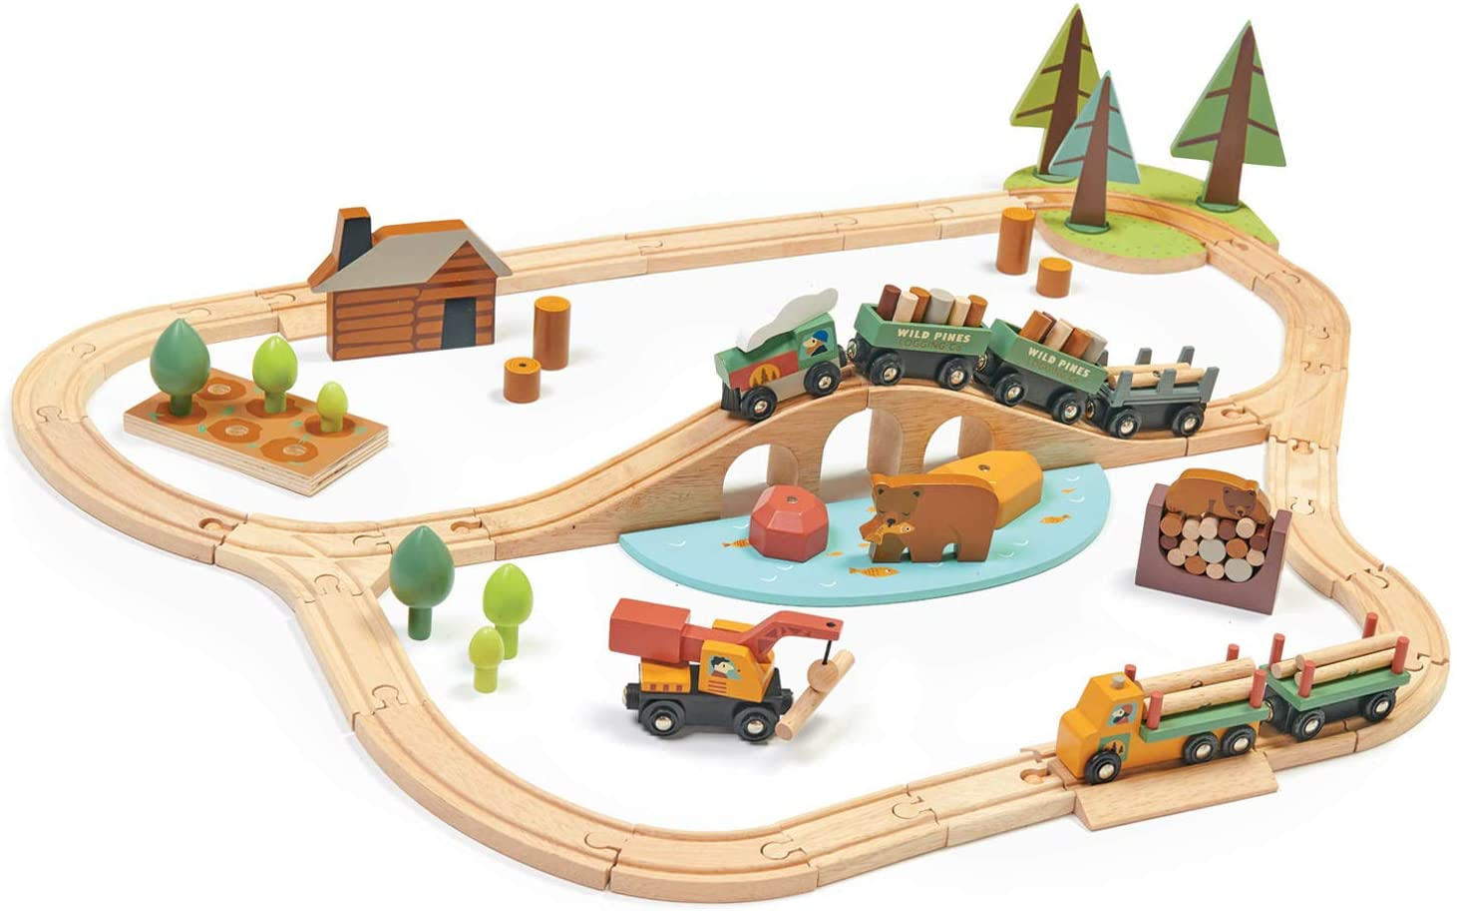 Discount is also underway Tender Leaf Toys - Wild Pines Train Stunning Wooden Lumber wholesale Set